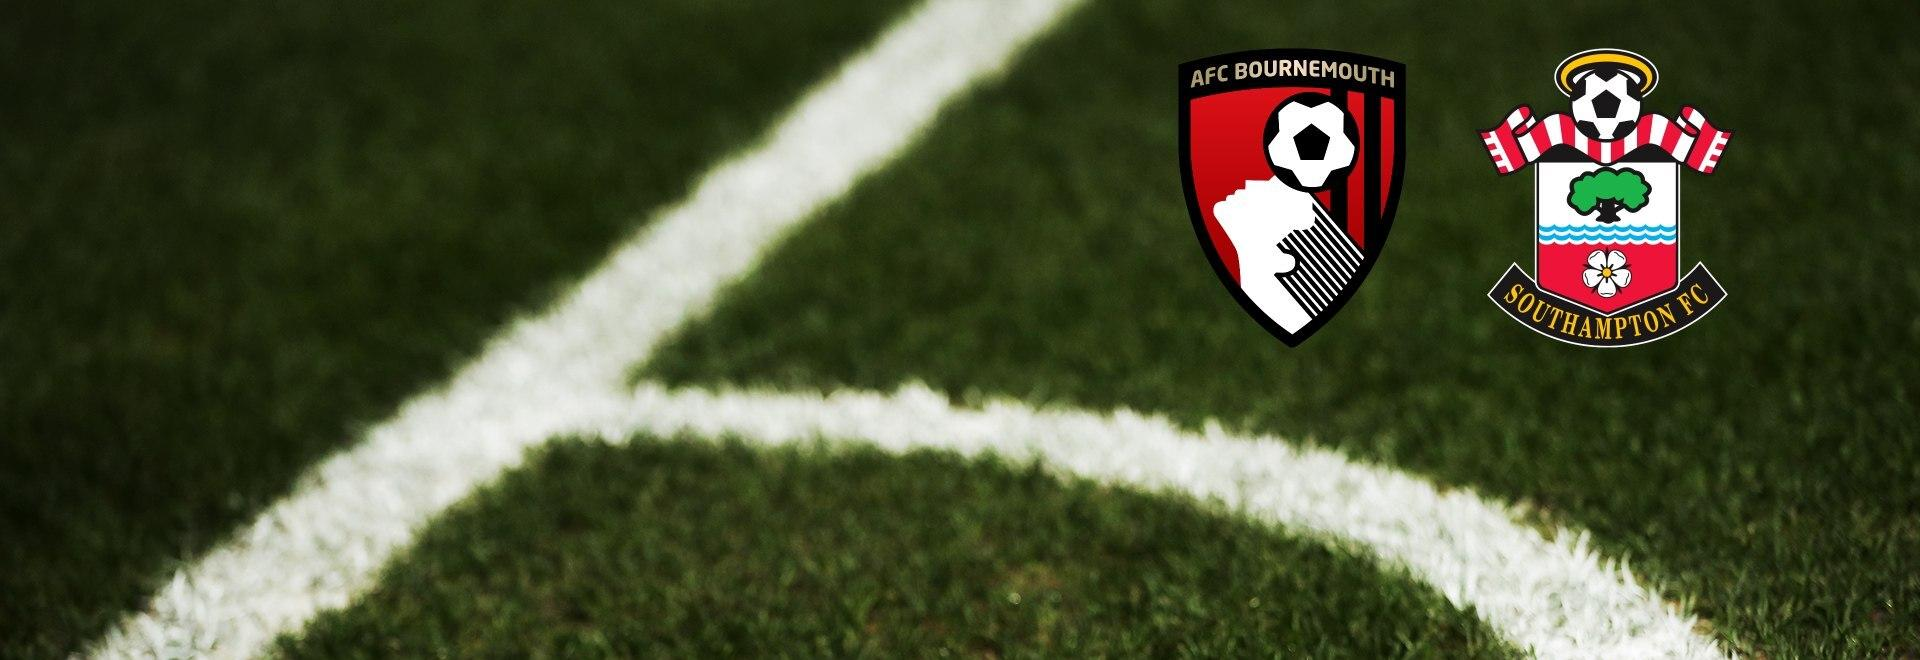 AFC Bournemouth - Southampton. Quarti